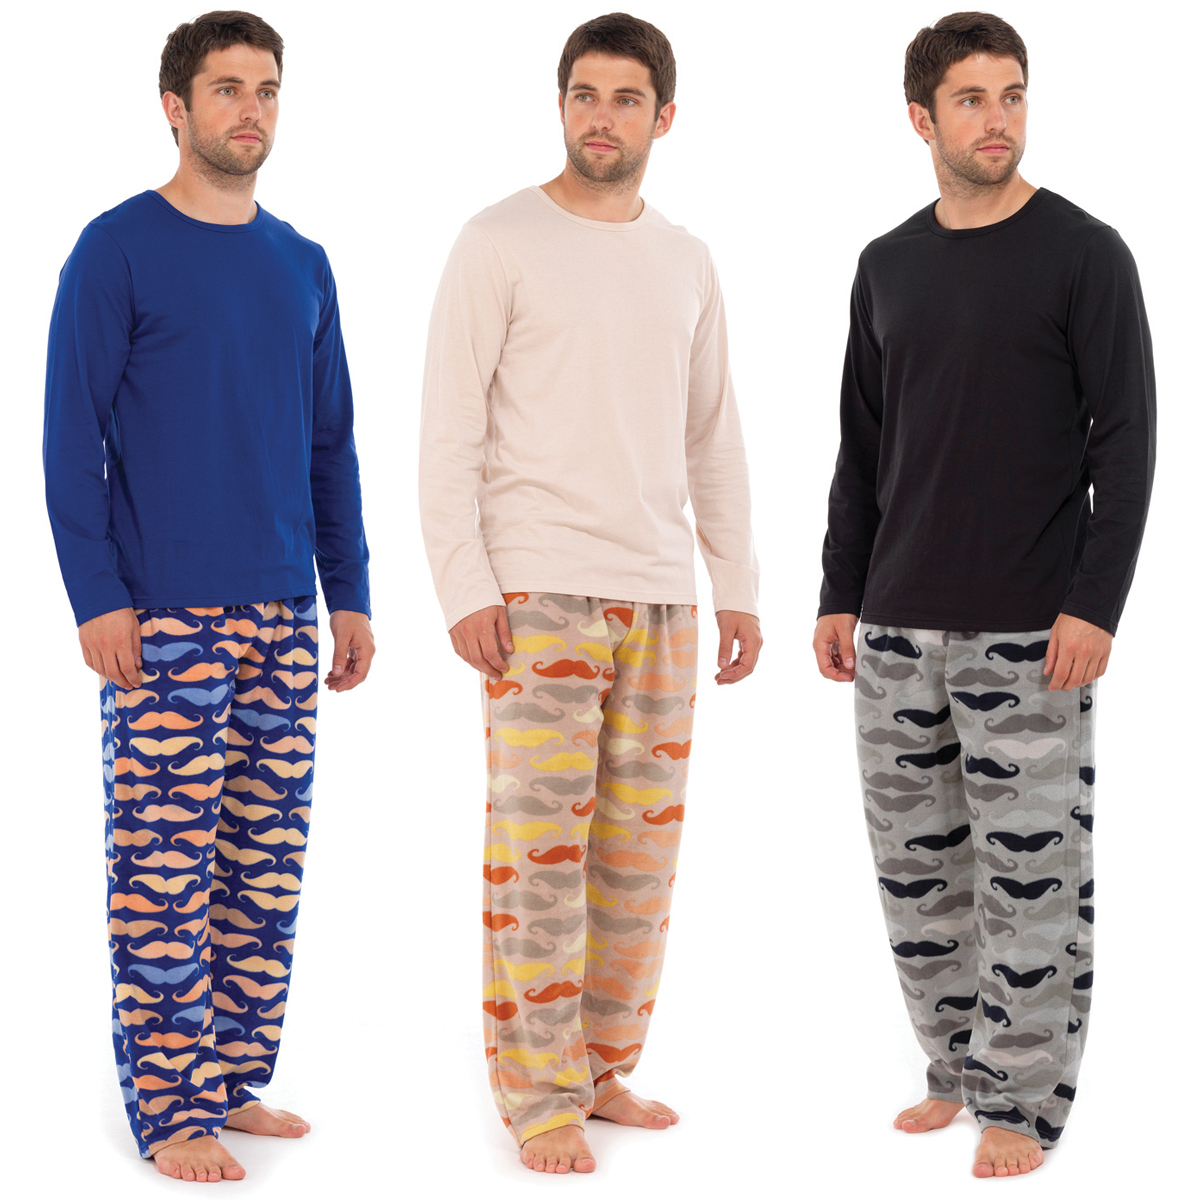 Mens Moustache PJ Print Fleece Pyjamas Sets Night Wear PJ's 2 ...